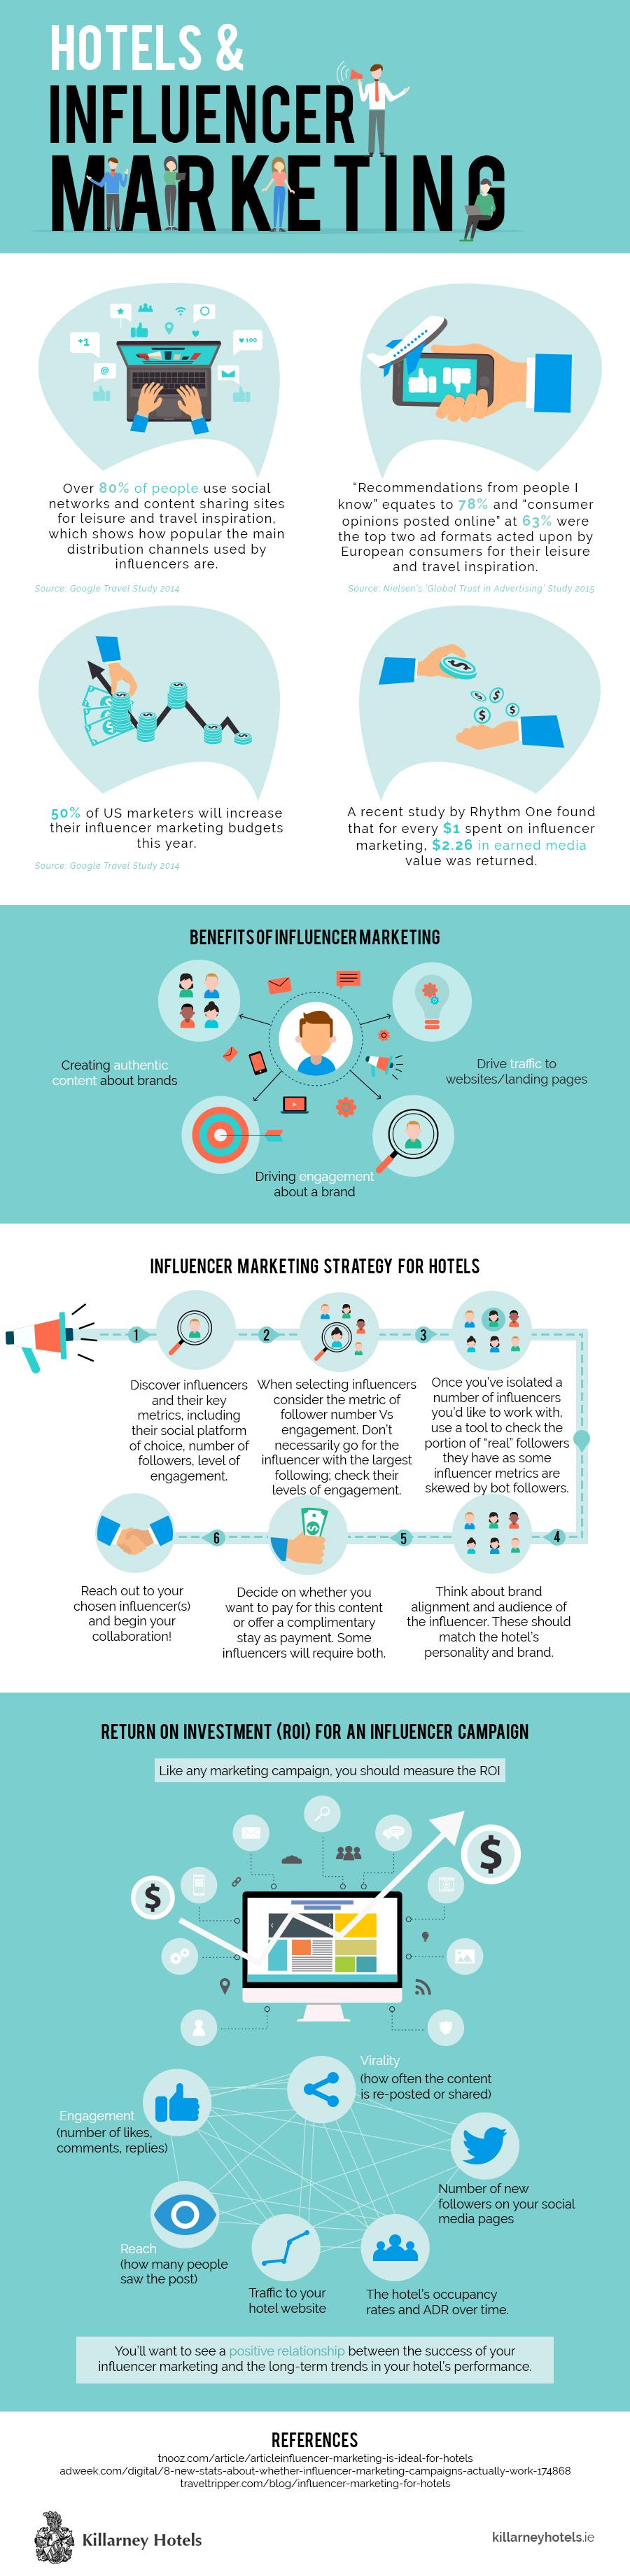 Hotels-Influencer-Marketing–Infographic.jpg